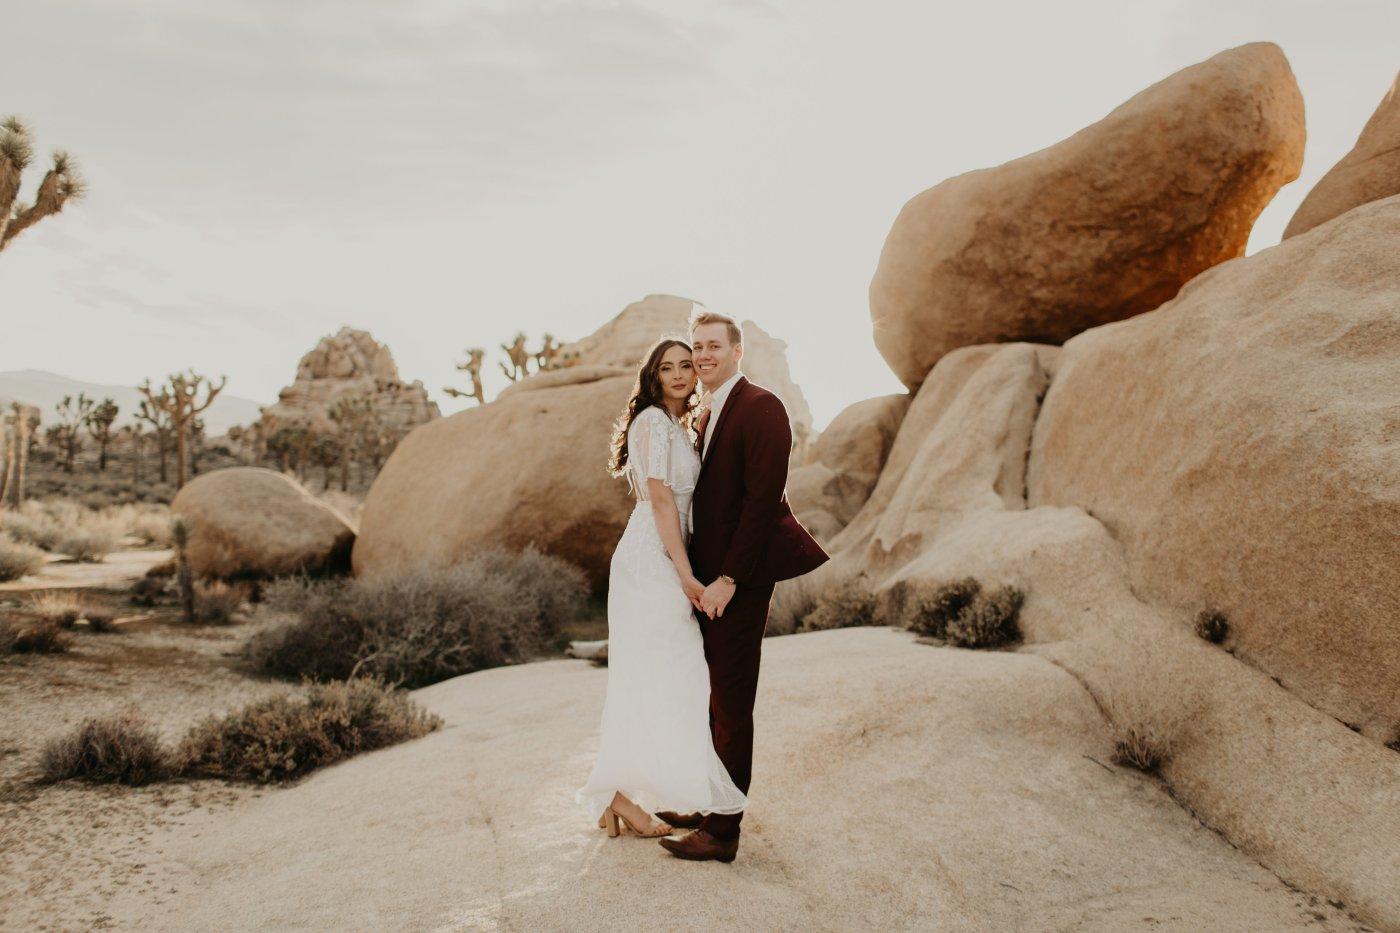 View More: http://michaelamangumphotography.pass.us/leah-engagements